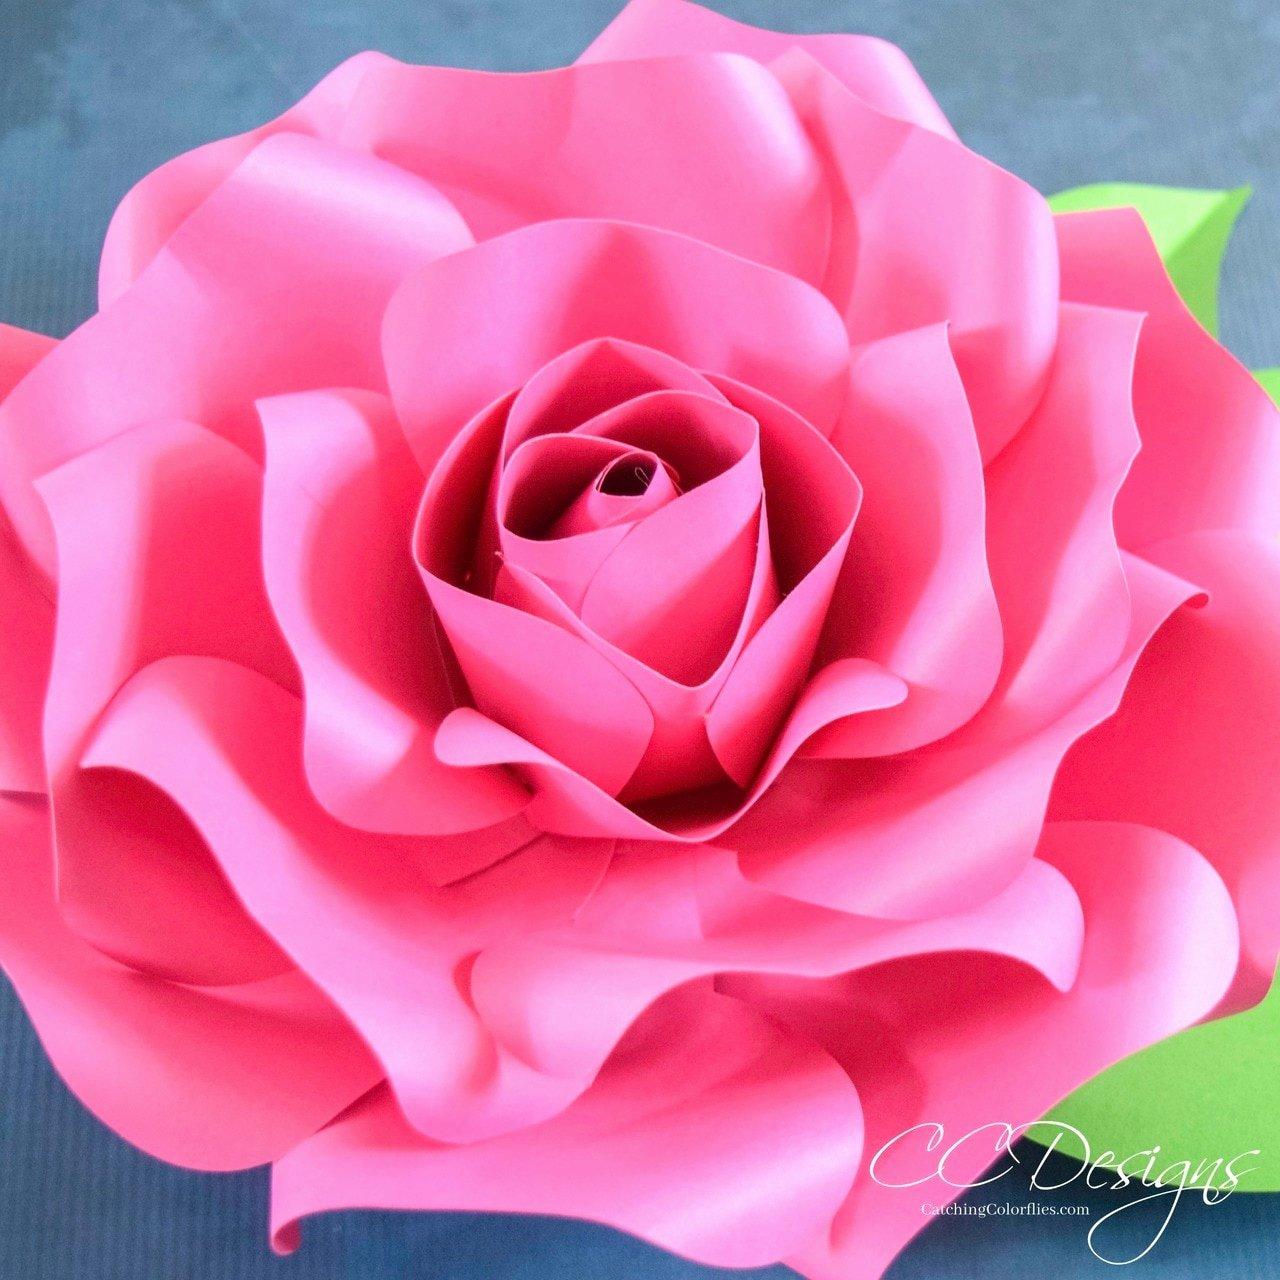 Free Rose Paper Flower Template Elegant Alora Garden Giant Paper Rose Template & Tutorial